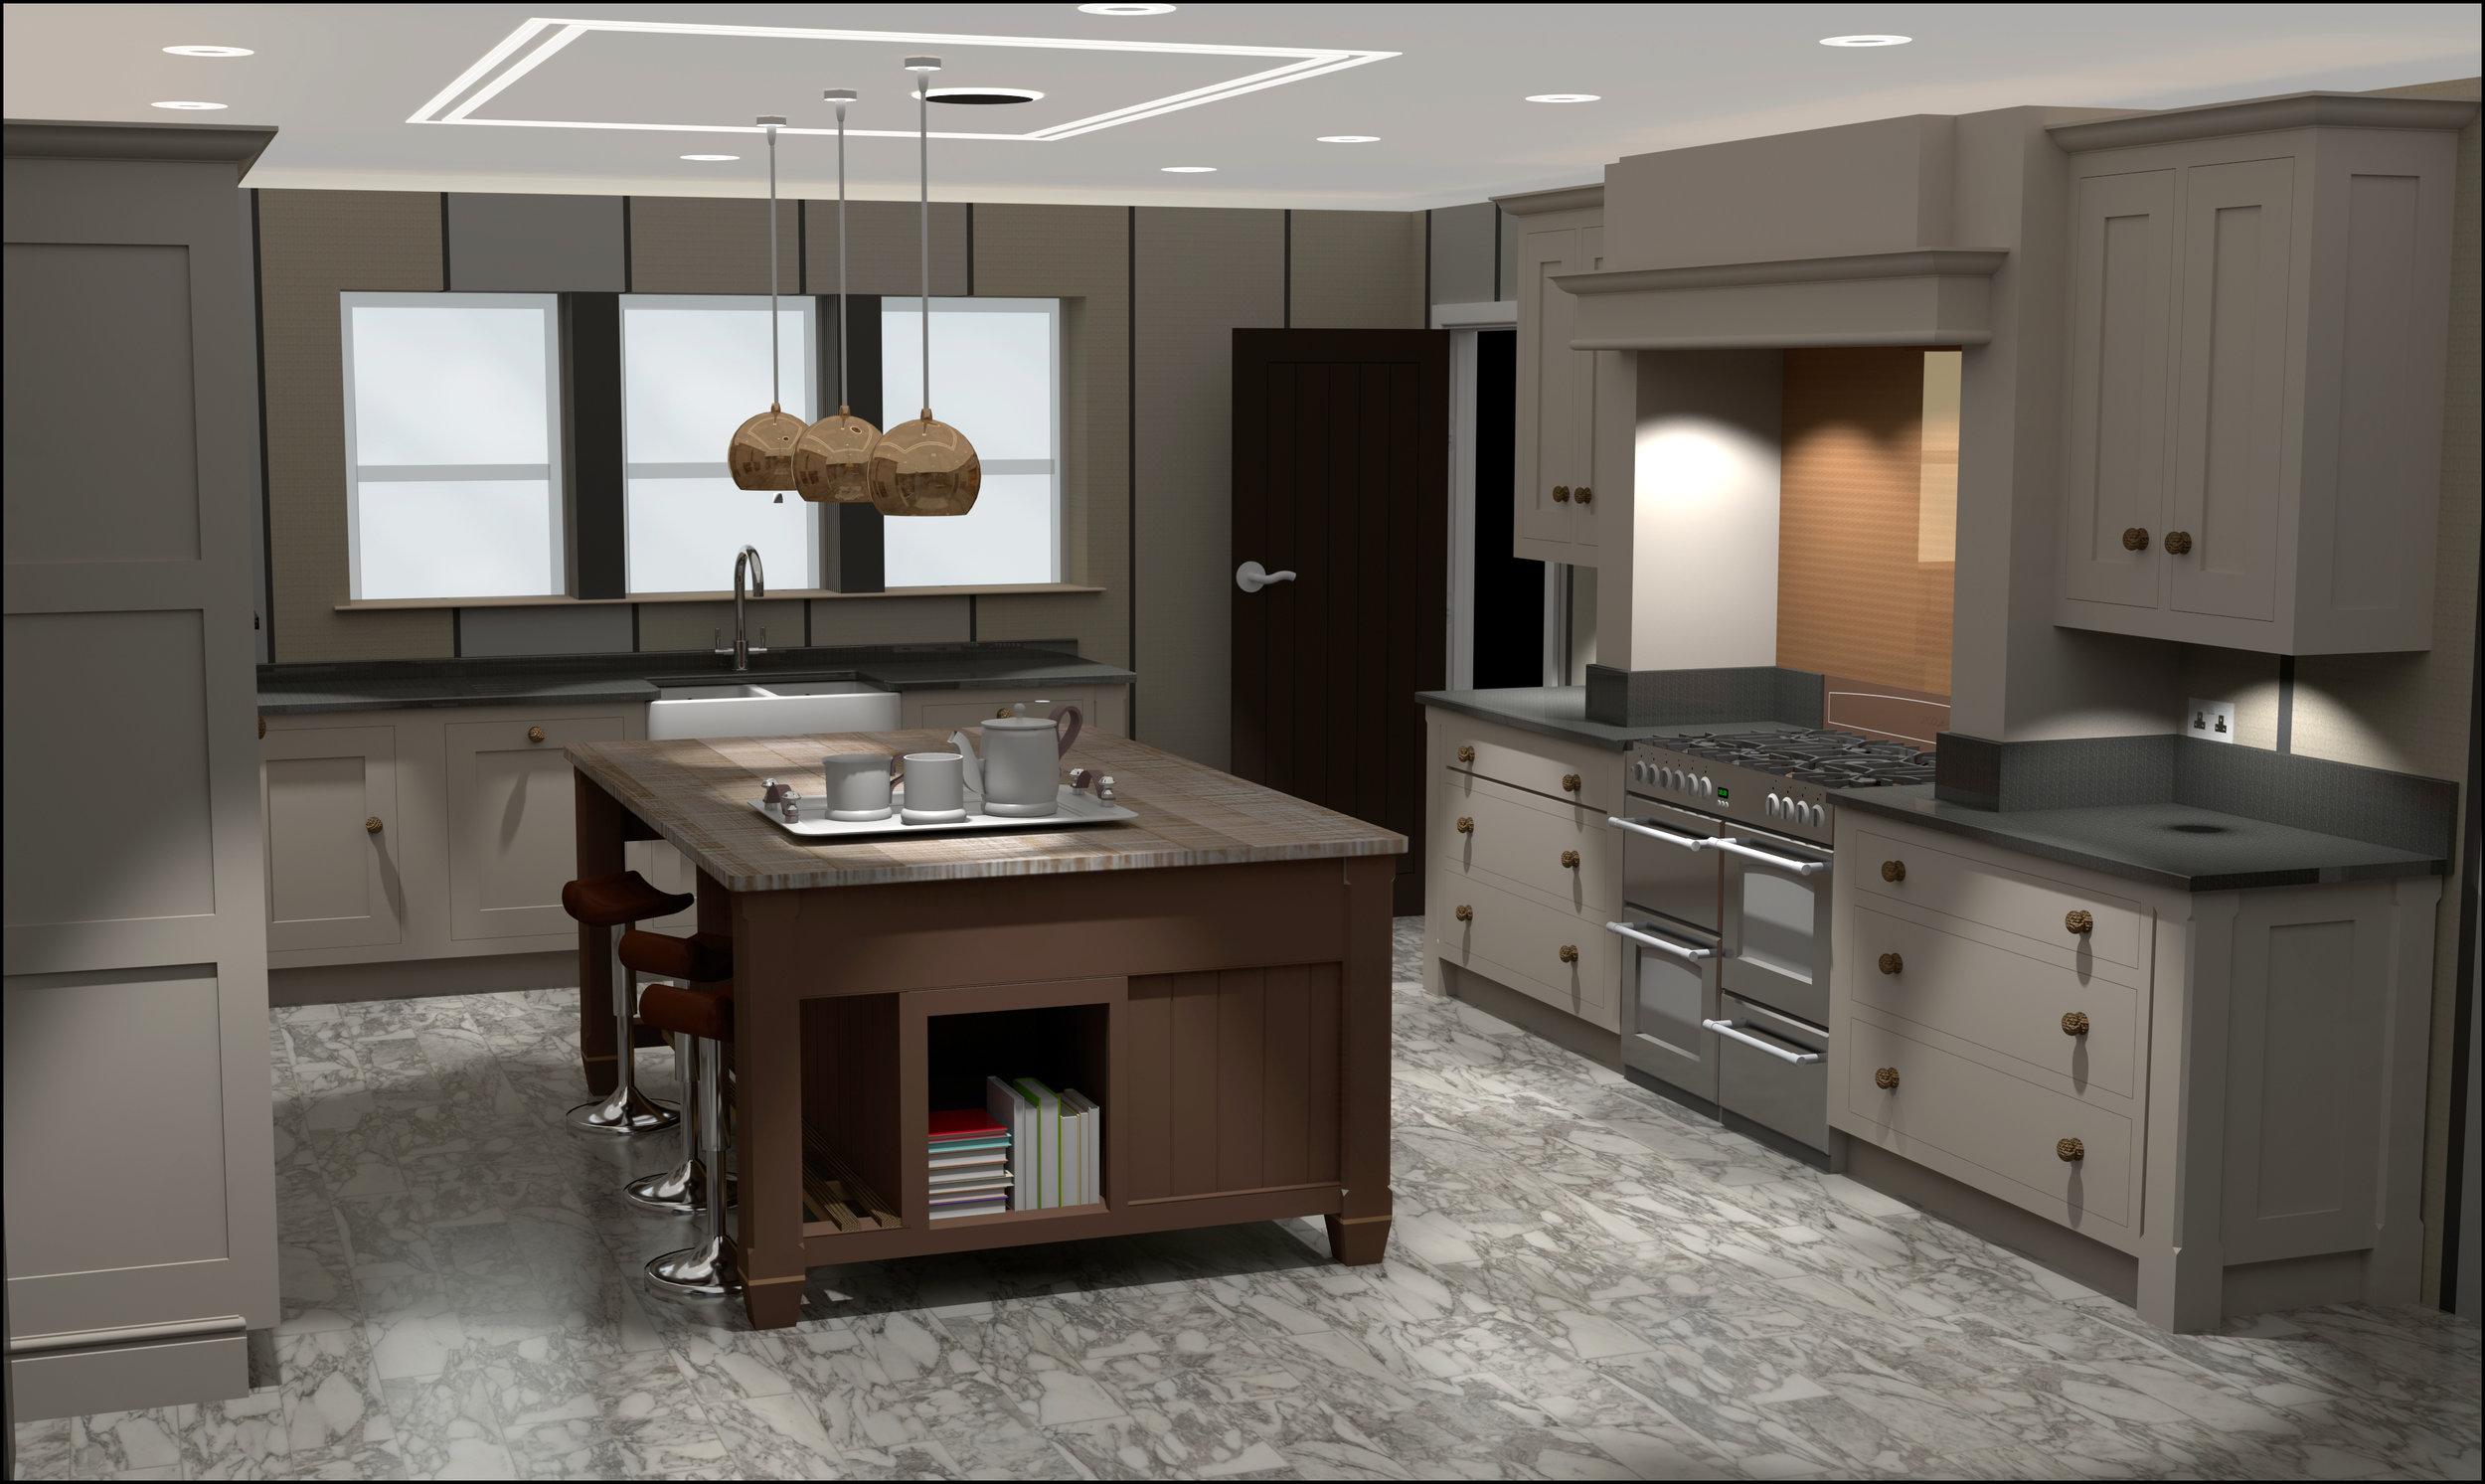 CGI kitchen concepts — Drew Forsyth & Co